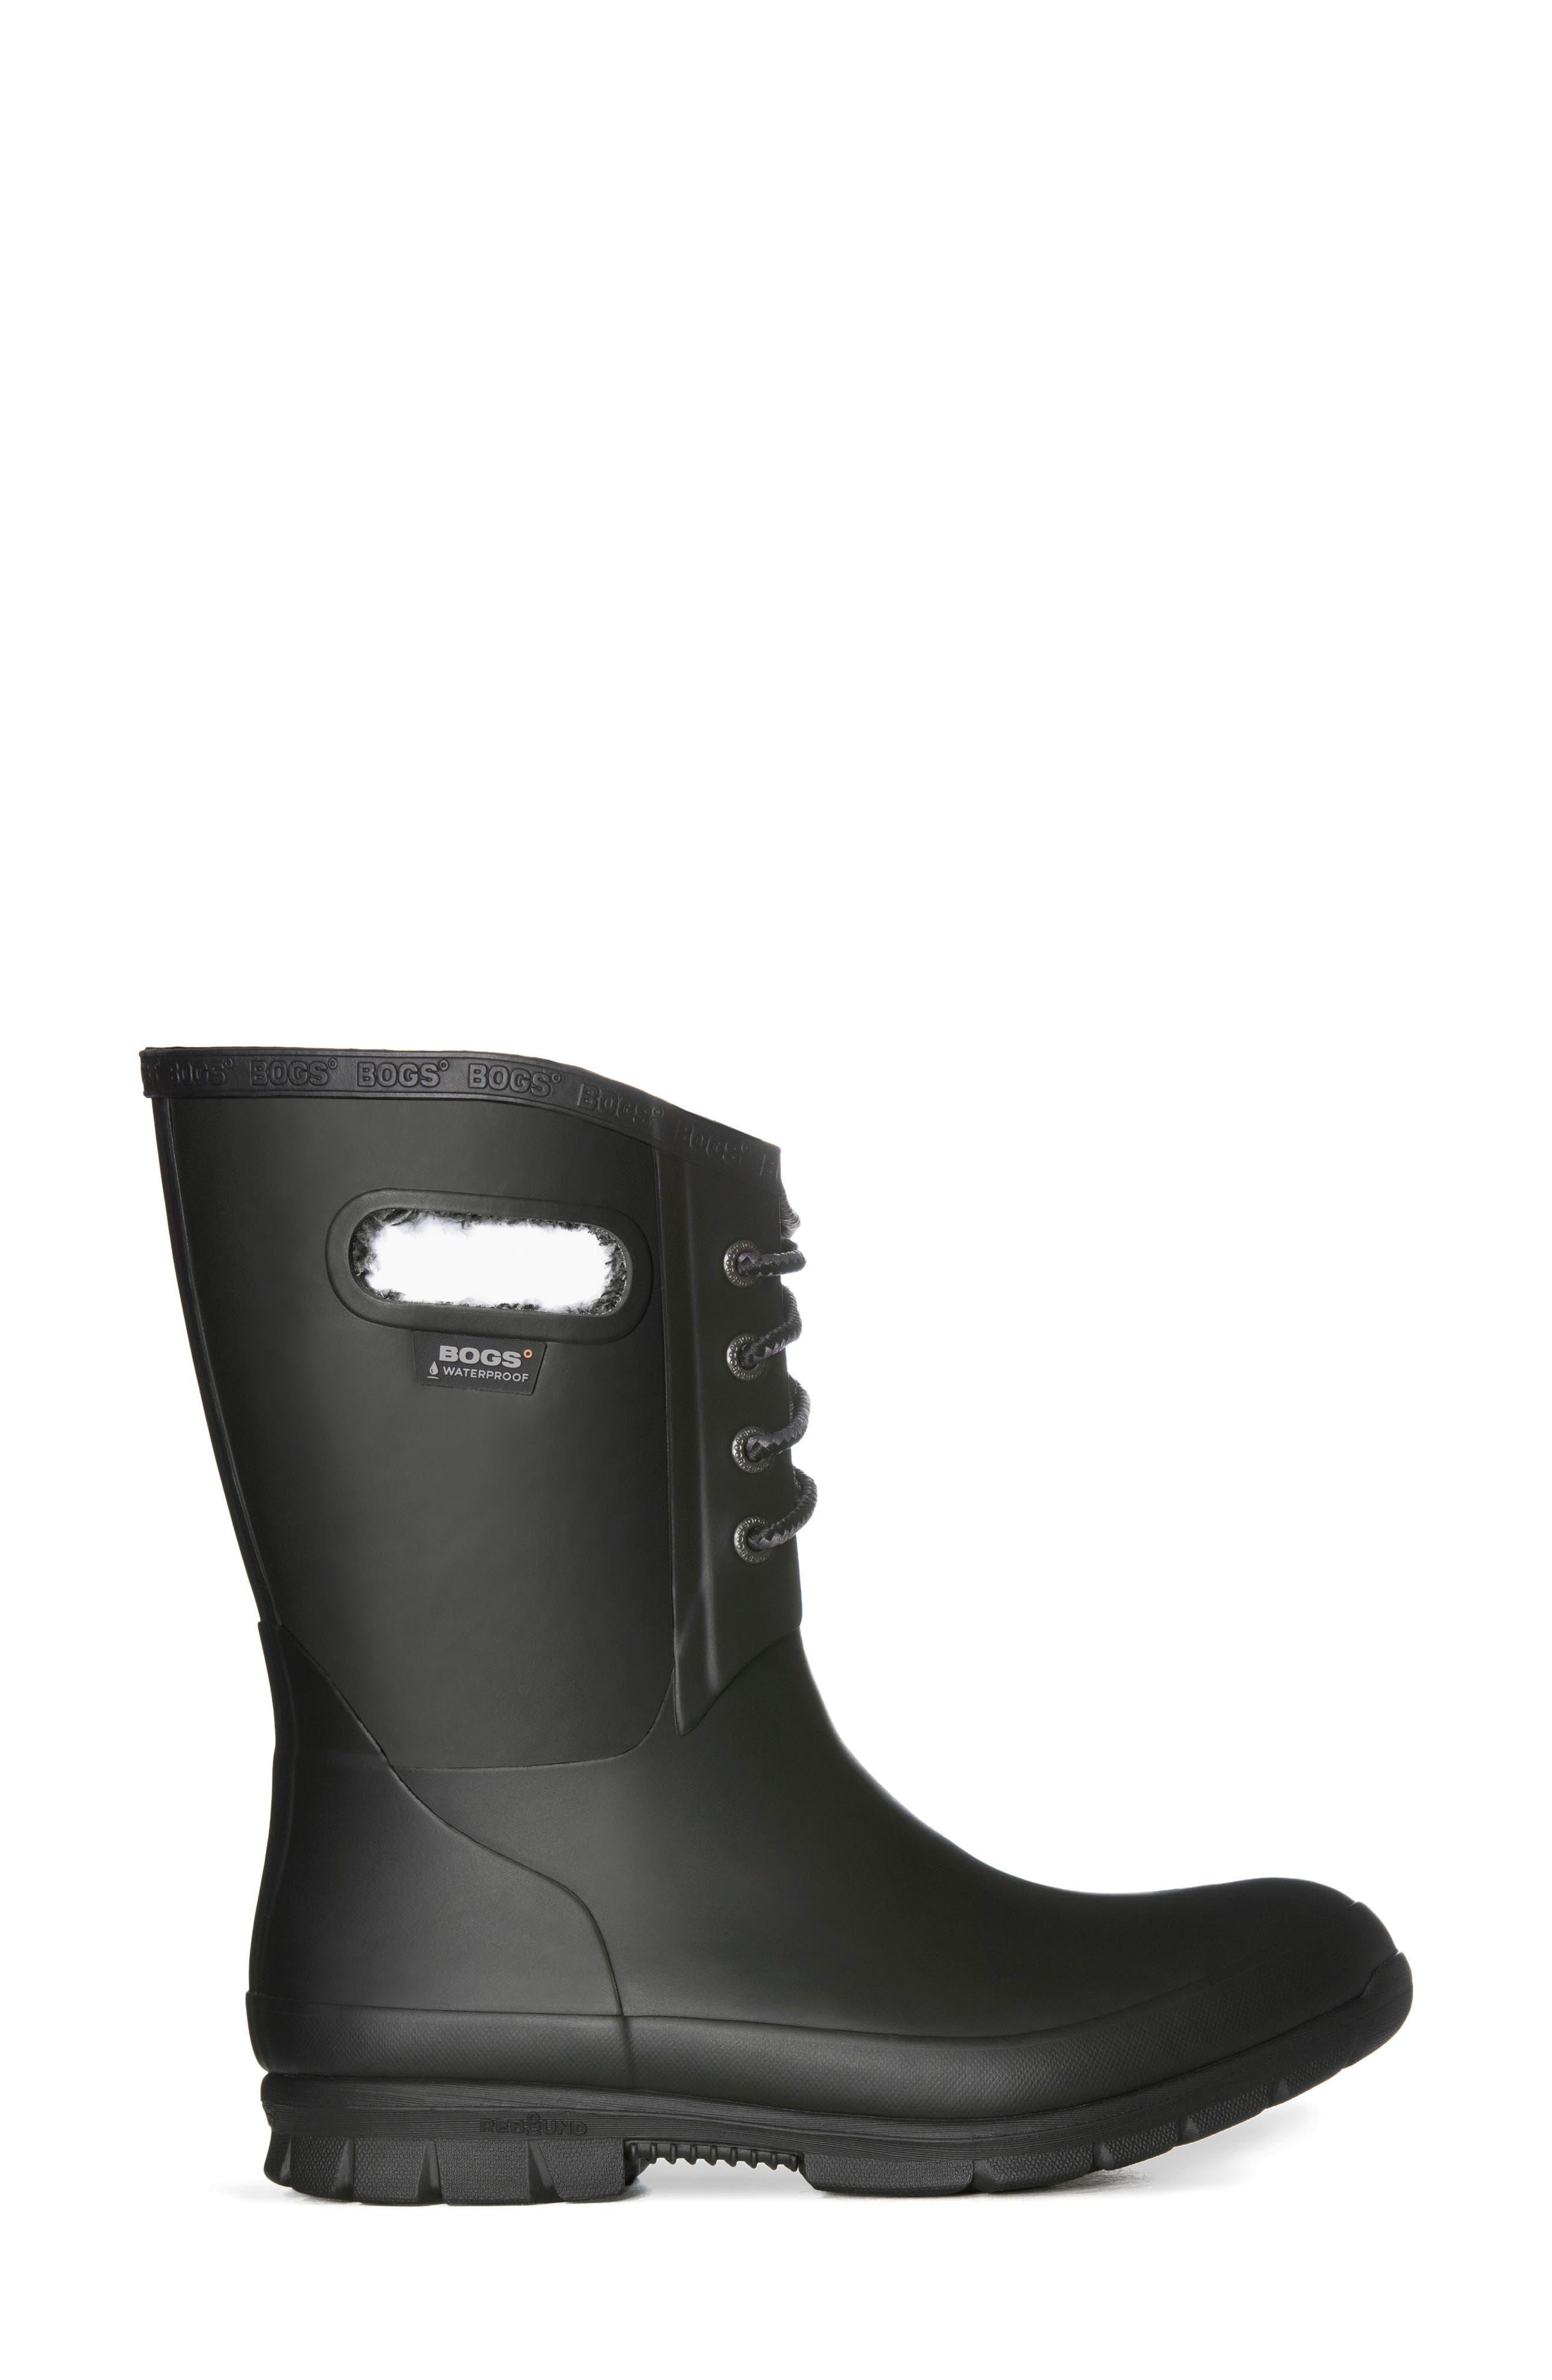 BOGS, Amanda Plush Waterproof Rain Boot, Alternate thumbnail 3, color, 001